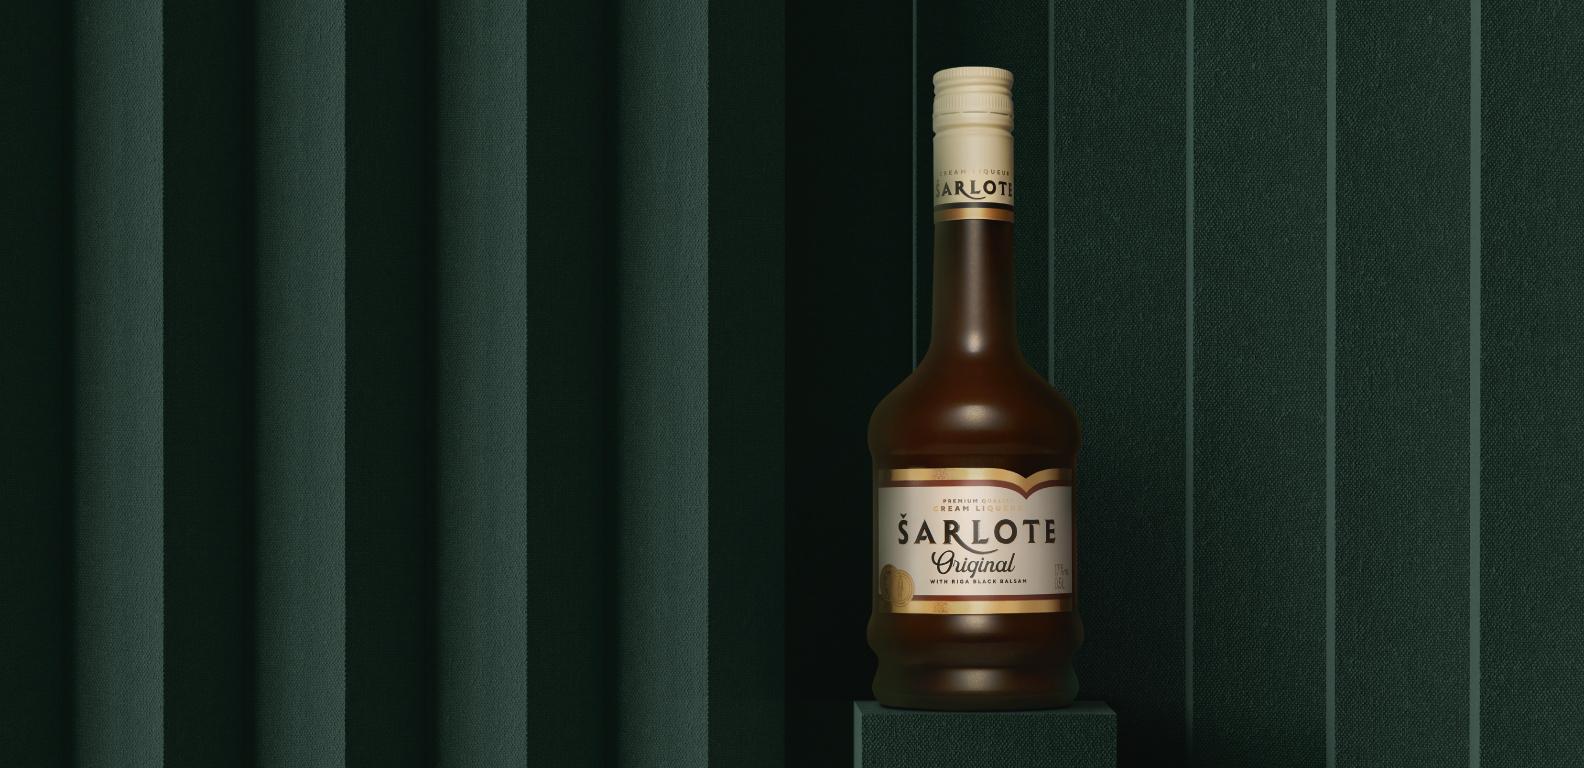 Sarlote - packaging design